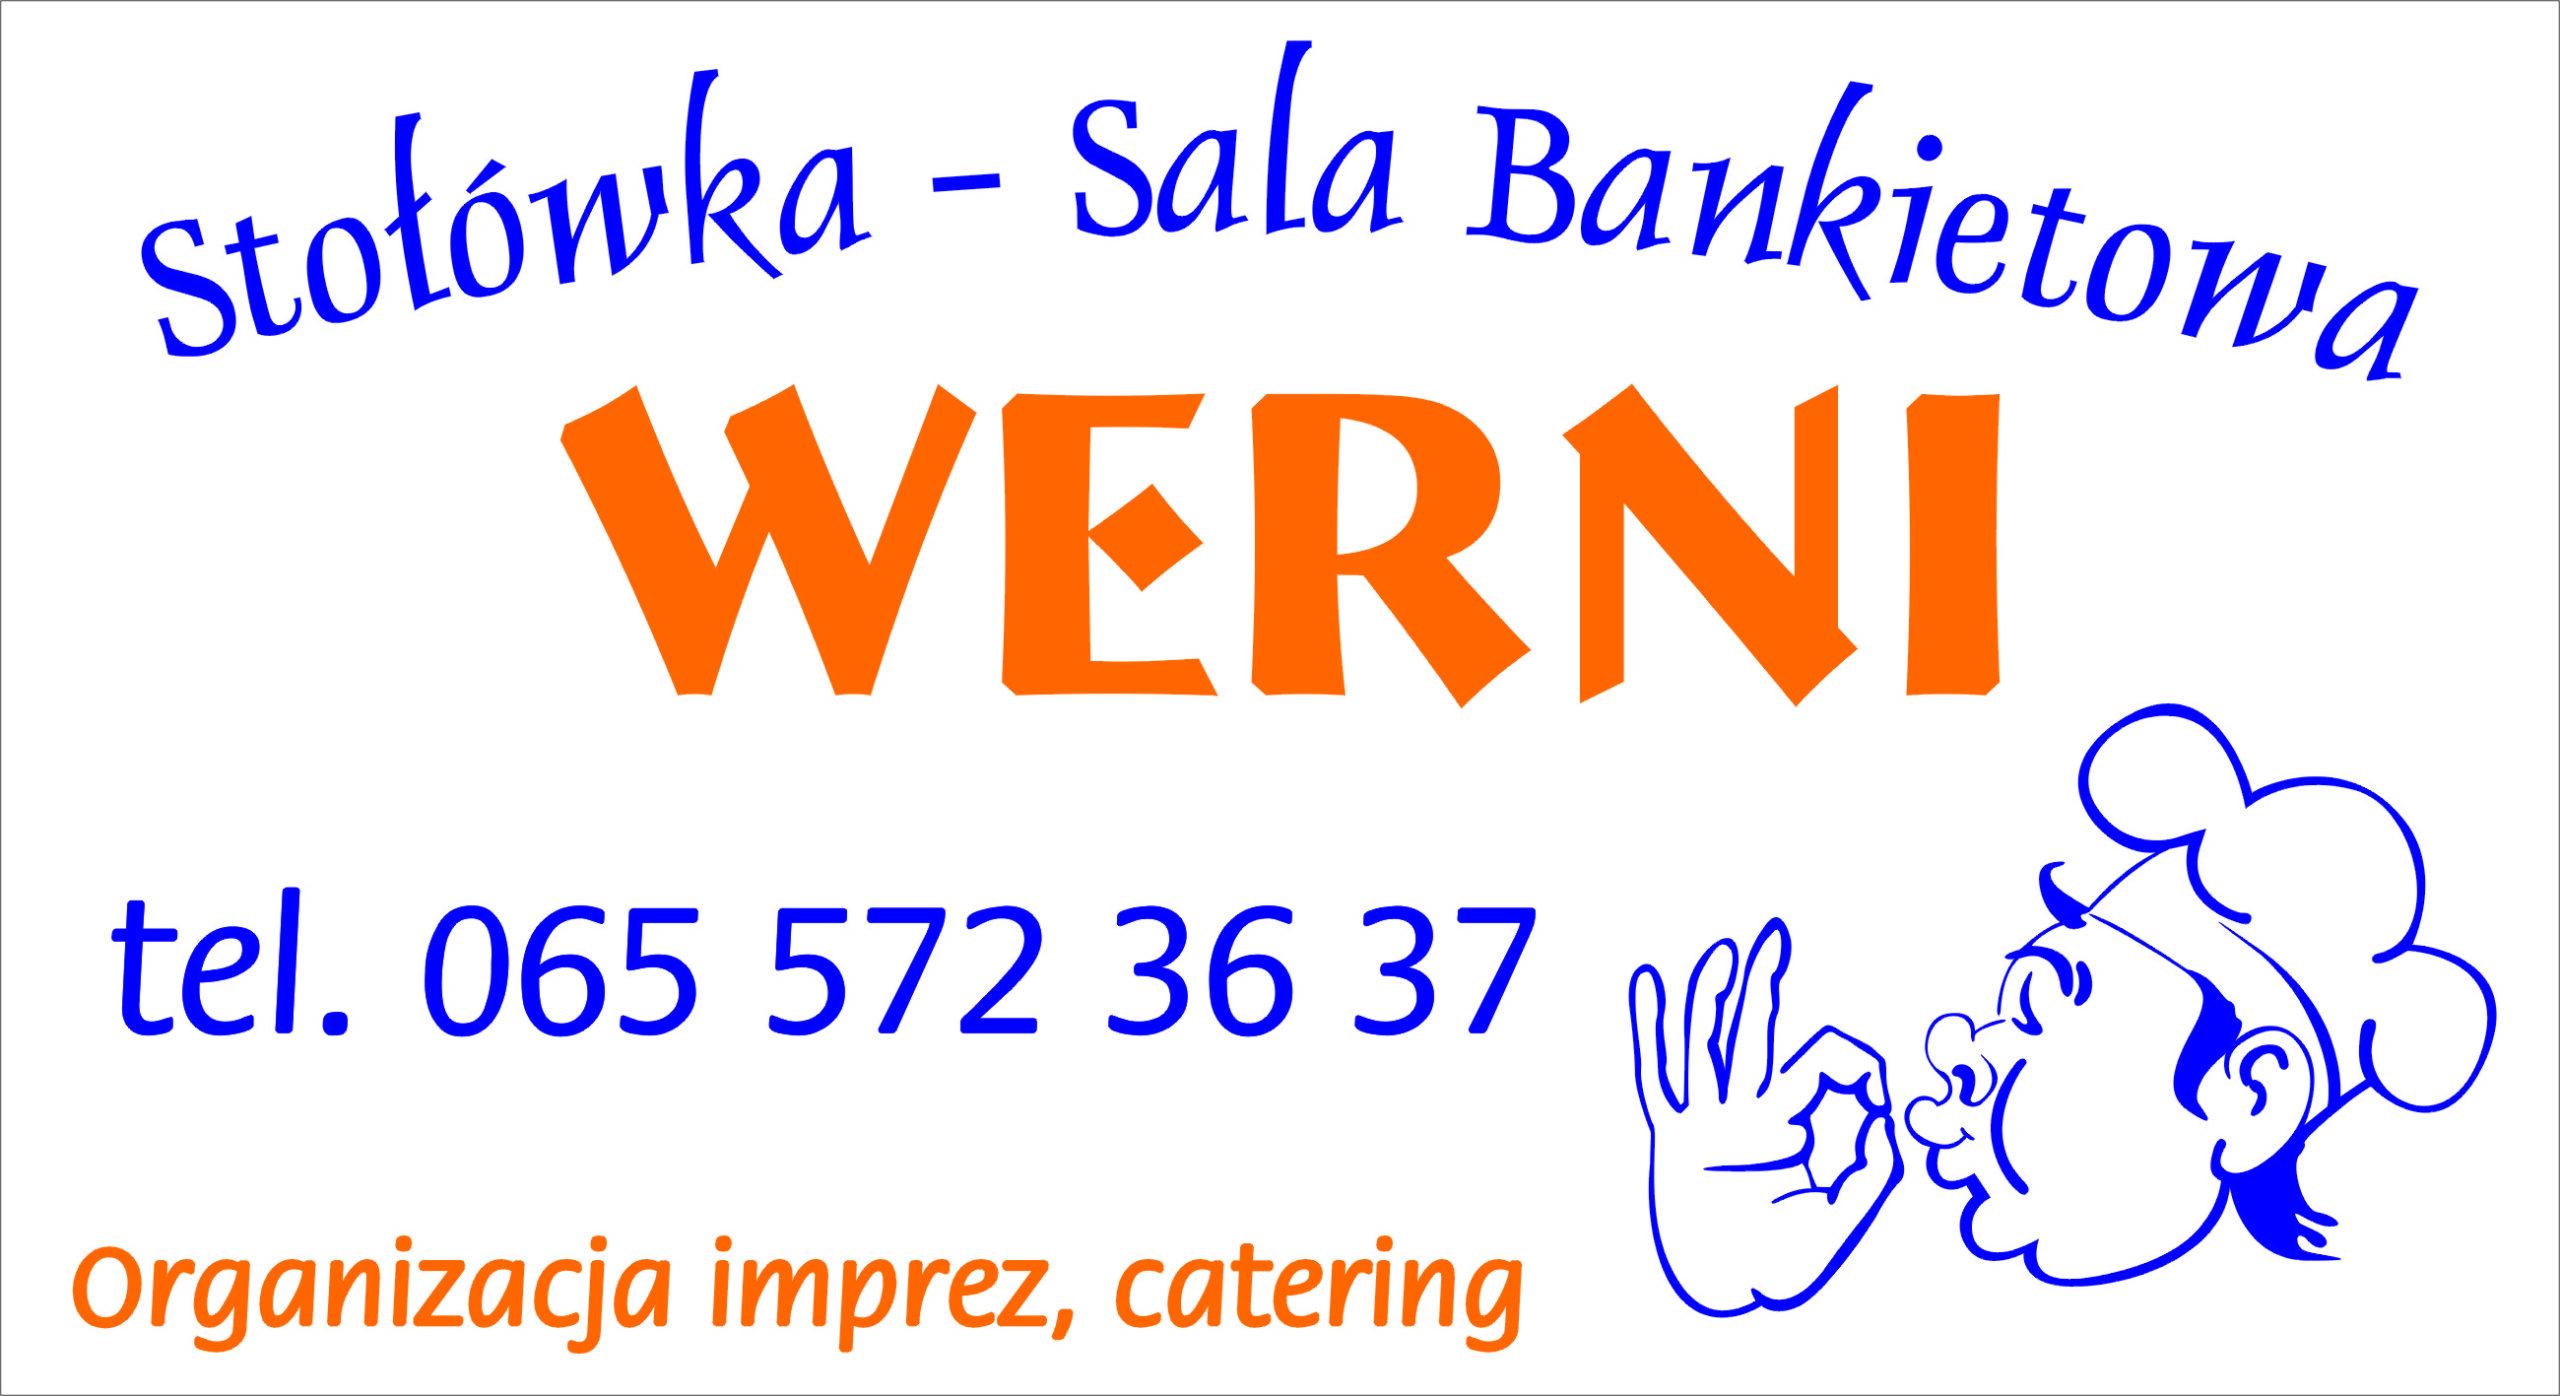 Werni logo